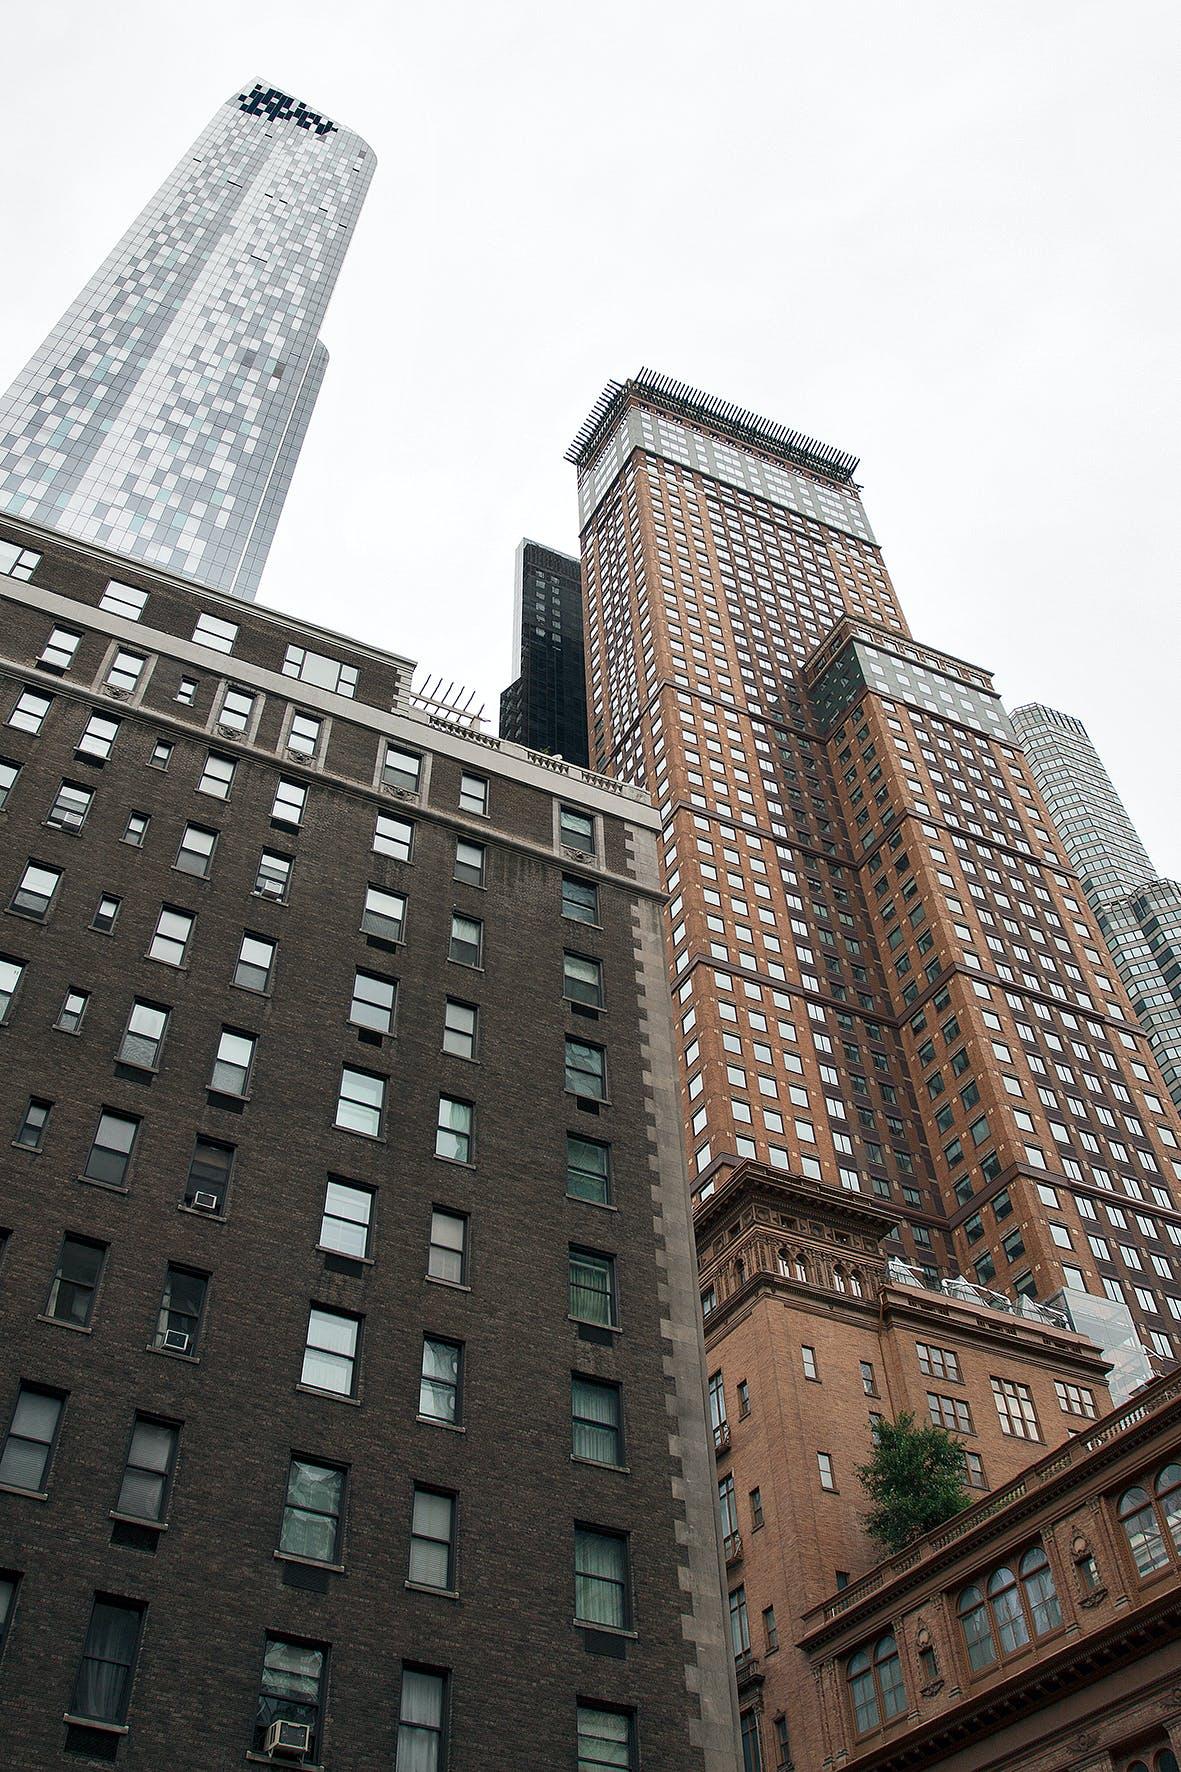 Free stock photo of city, skyscrapers, urban